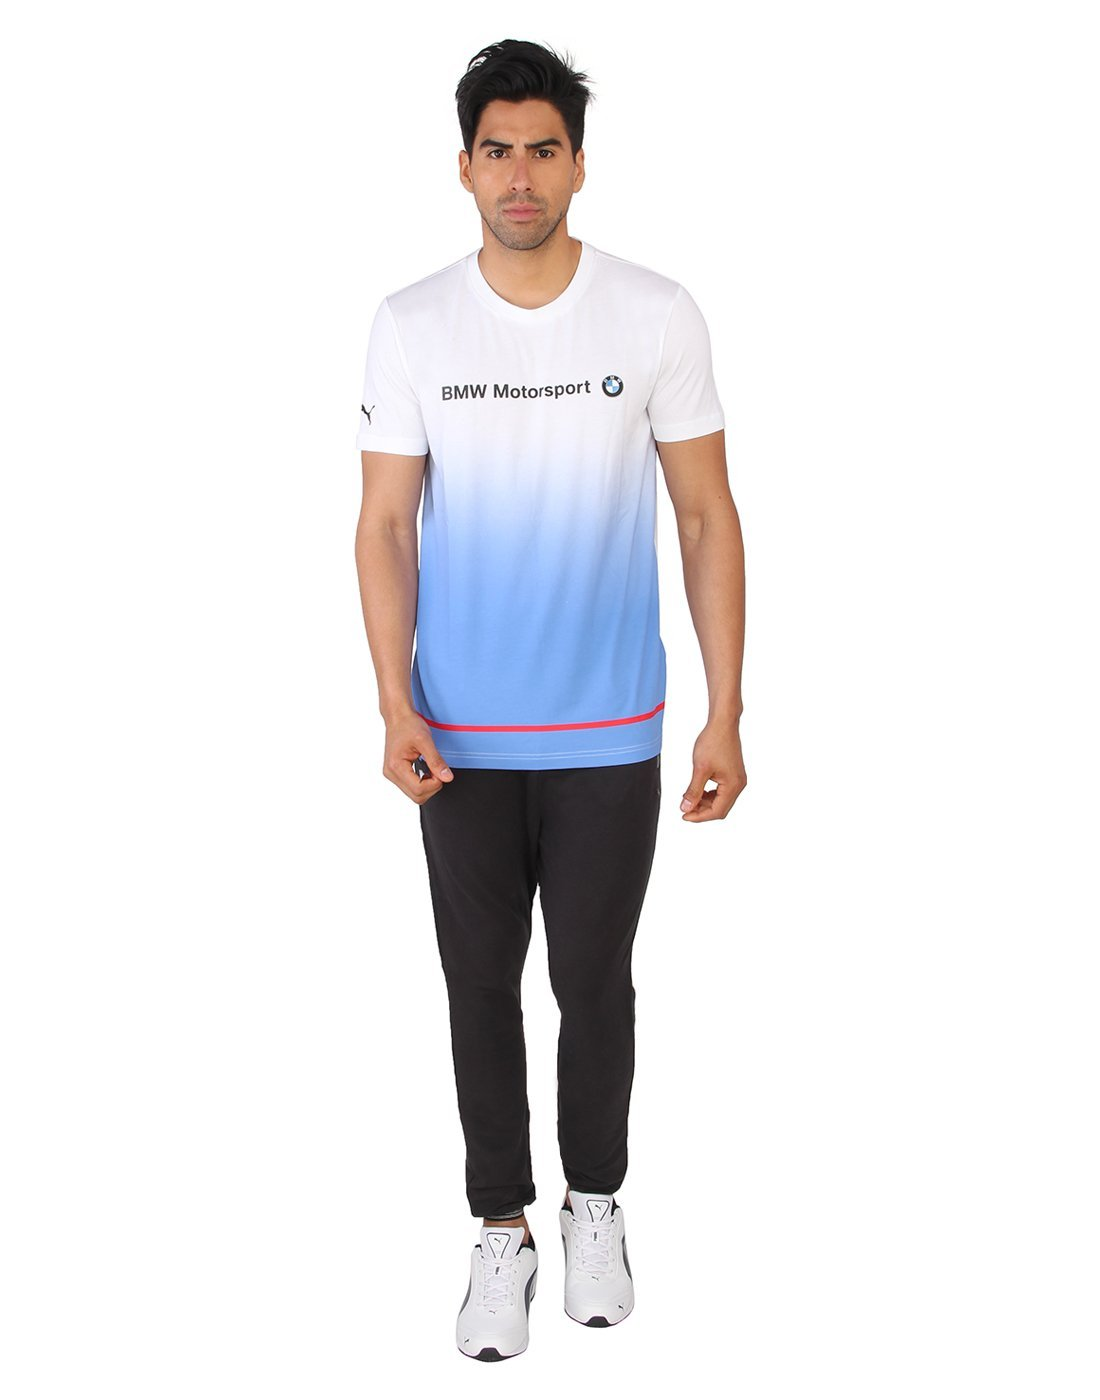 PUMA BMW Motorsport – Camiseta para Hombre (761863), Blanco ...